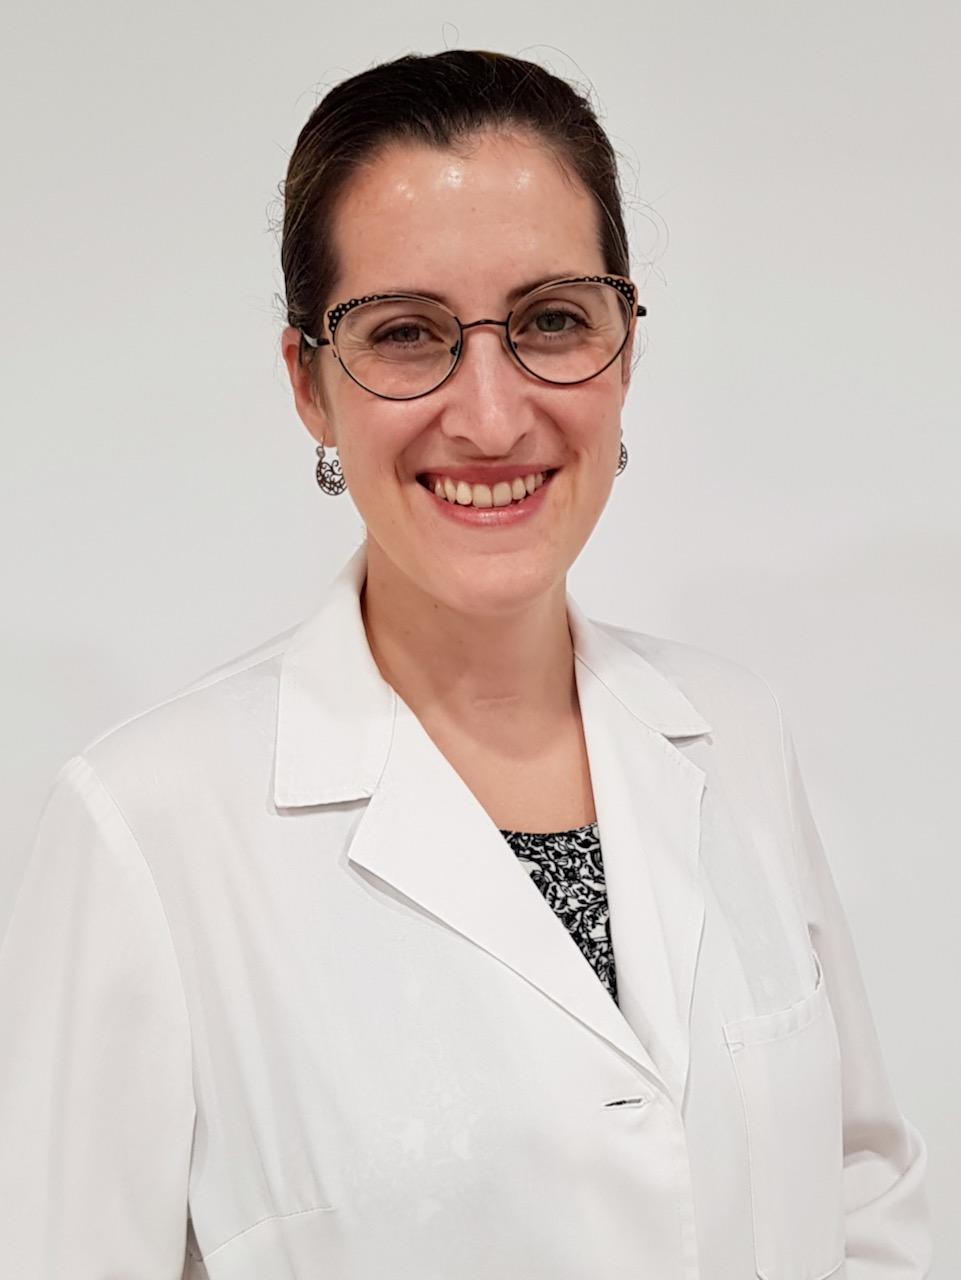 Dra. Carla Moreno Galindo